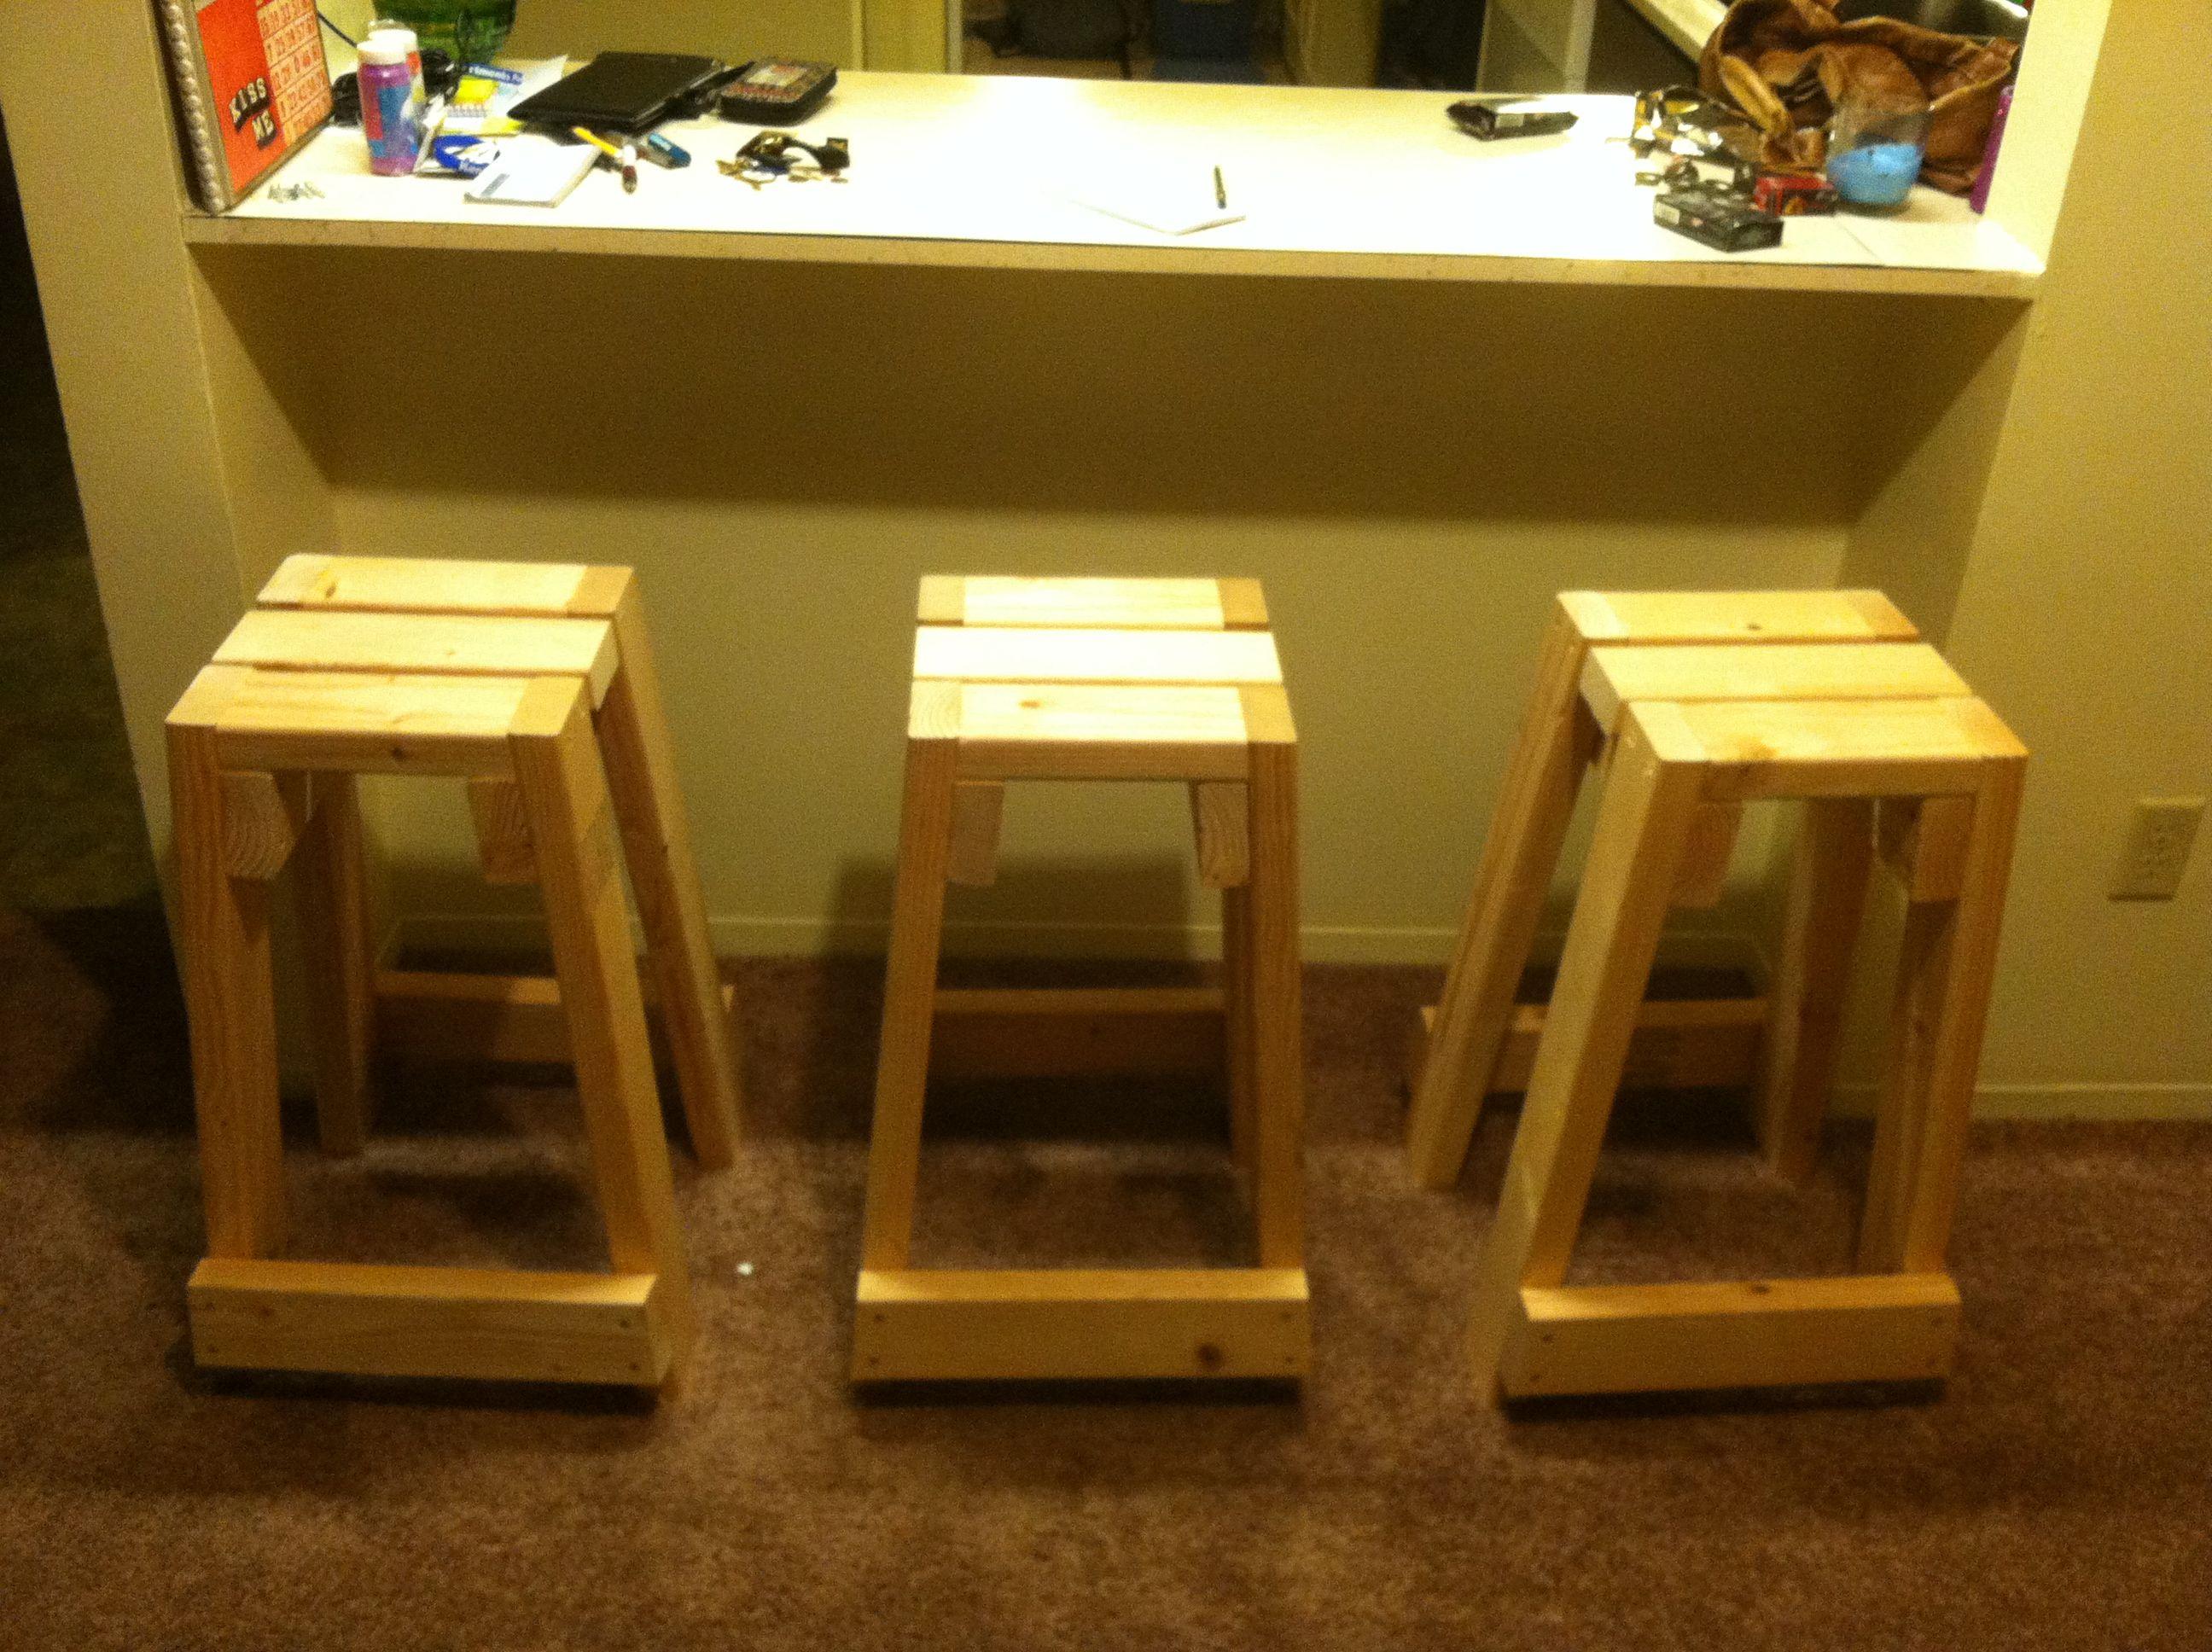 Quick build 2x4 stools My projects Pinterest Stools